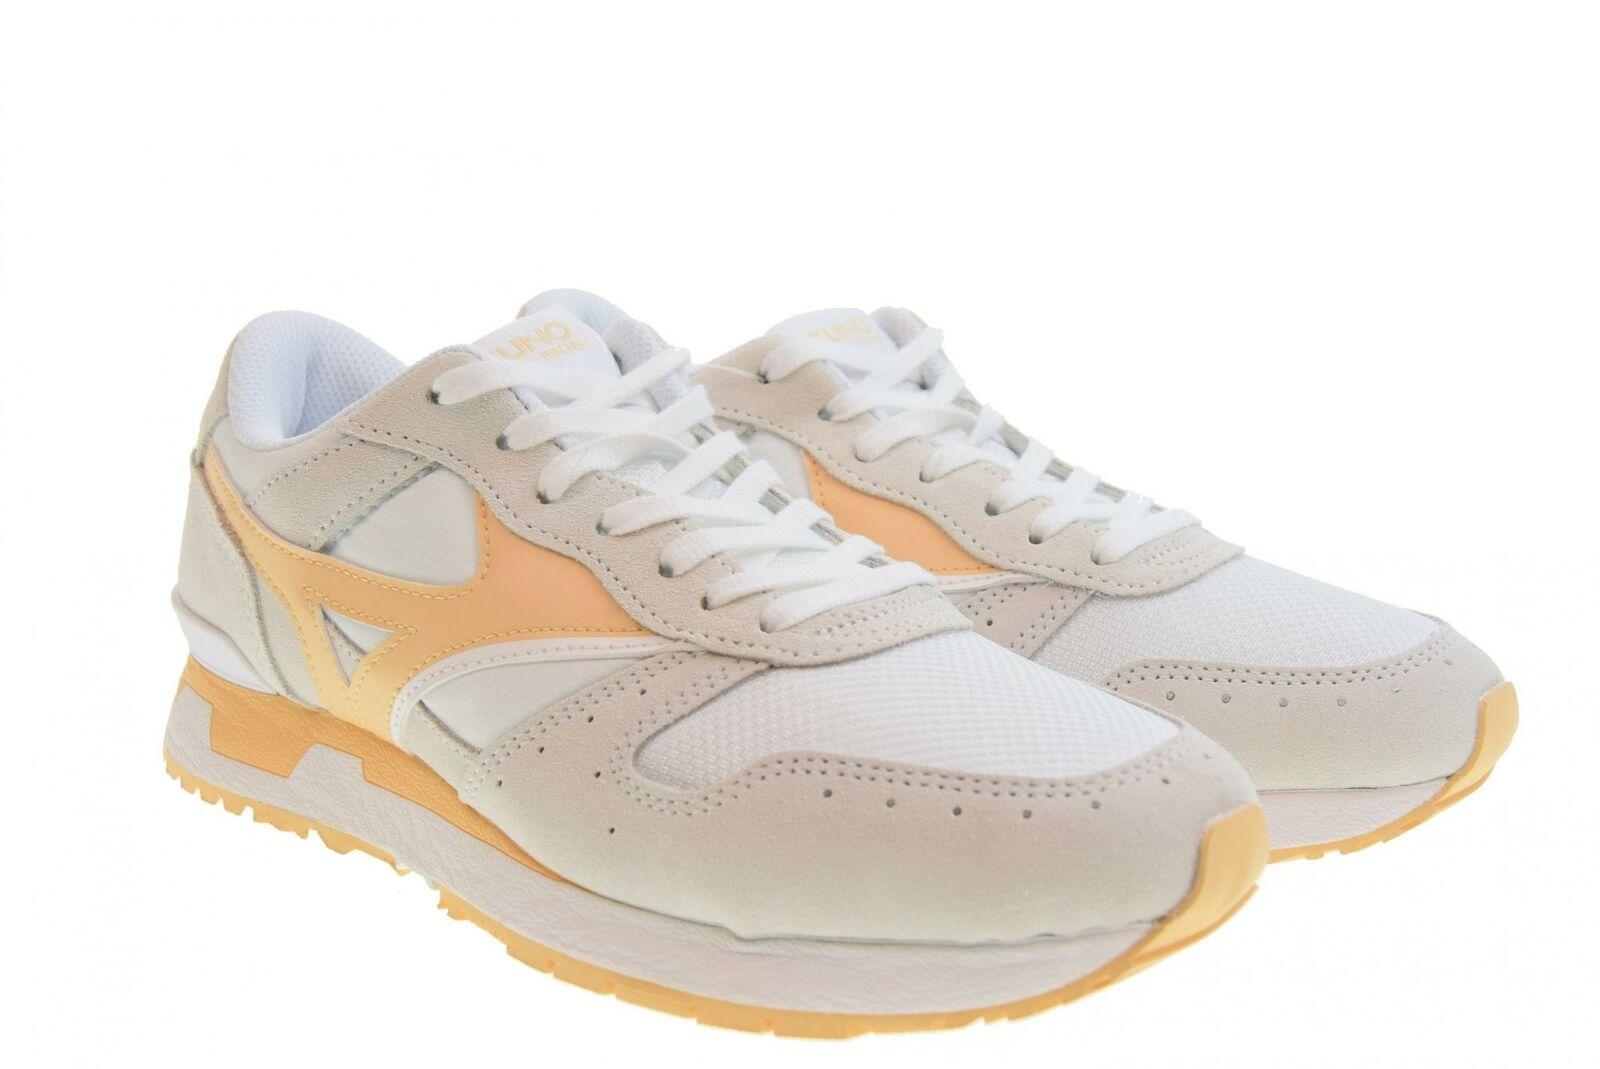 Mizuno 1906 P19us shoes woman low sneakers D1GA190851 MIZUNO GV87